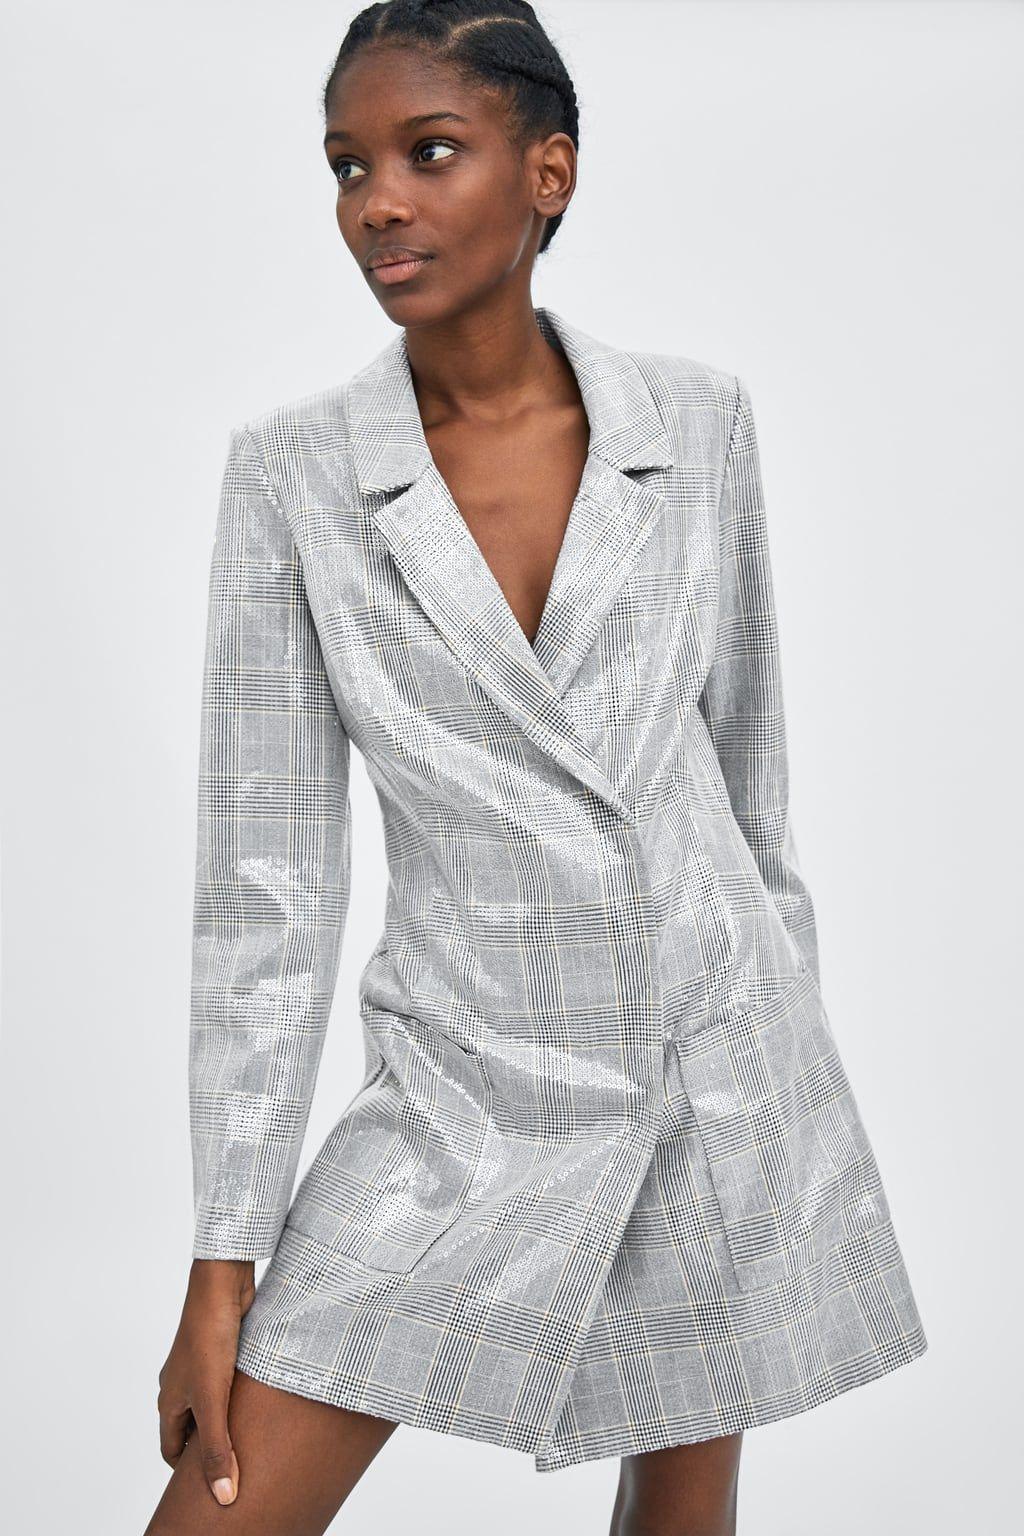 Unterteilen Normalerweise Überschuss  Imagen 2 de VESTIDO BLAZER LENTEJUELAS de Zara | Dresses, Blazer dress,  Special event dresses